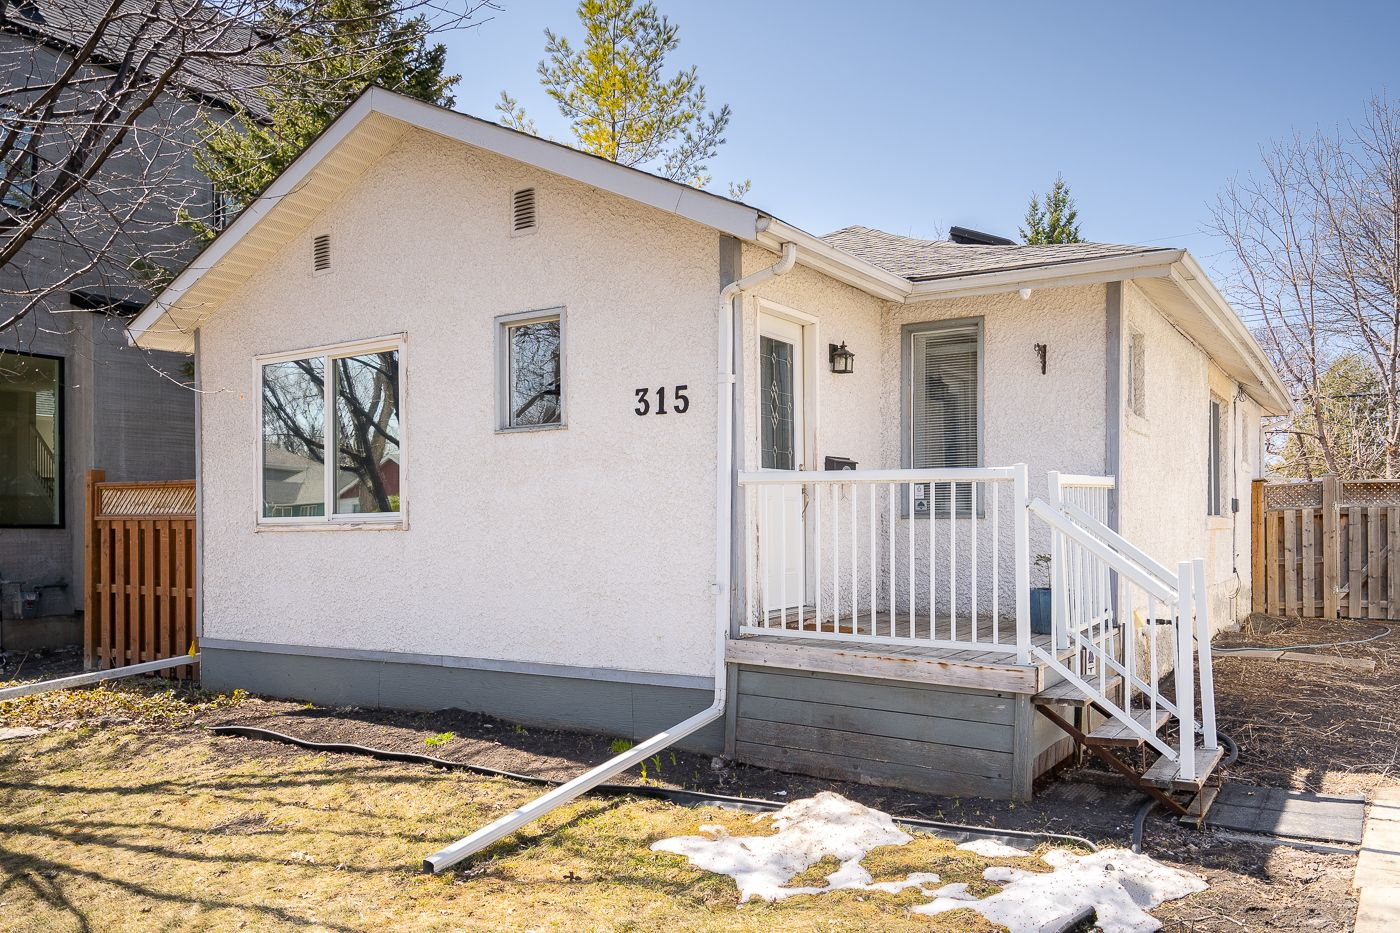 Main Photo: 315 Beaverbrook Street in Winnipeg: River Heights House for sale (1C)  : MLS®# 202107126